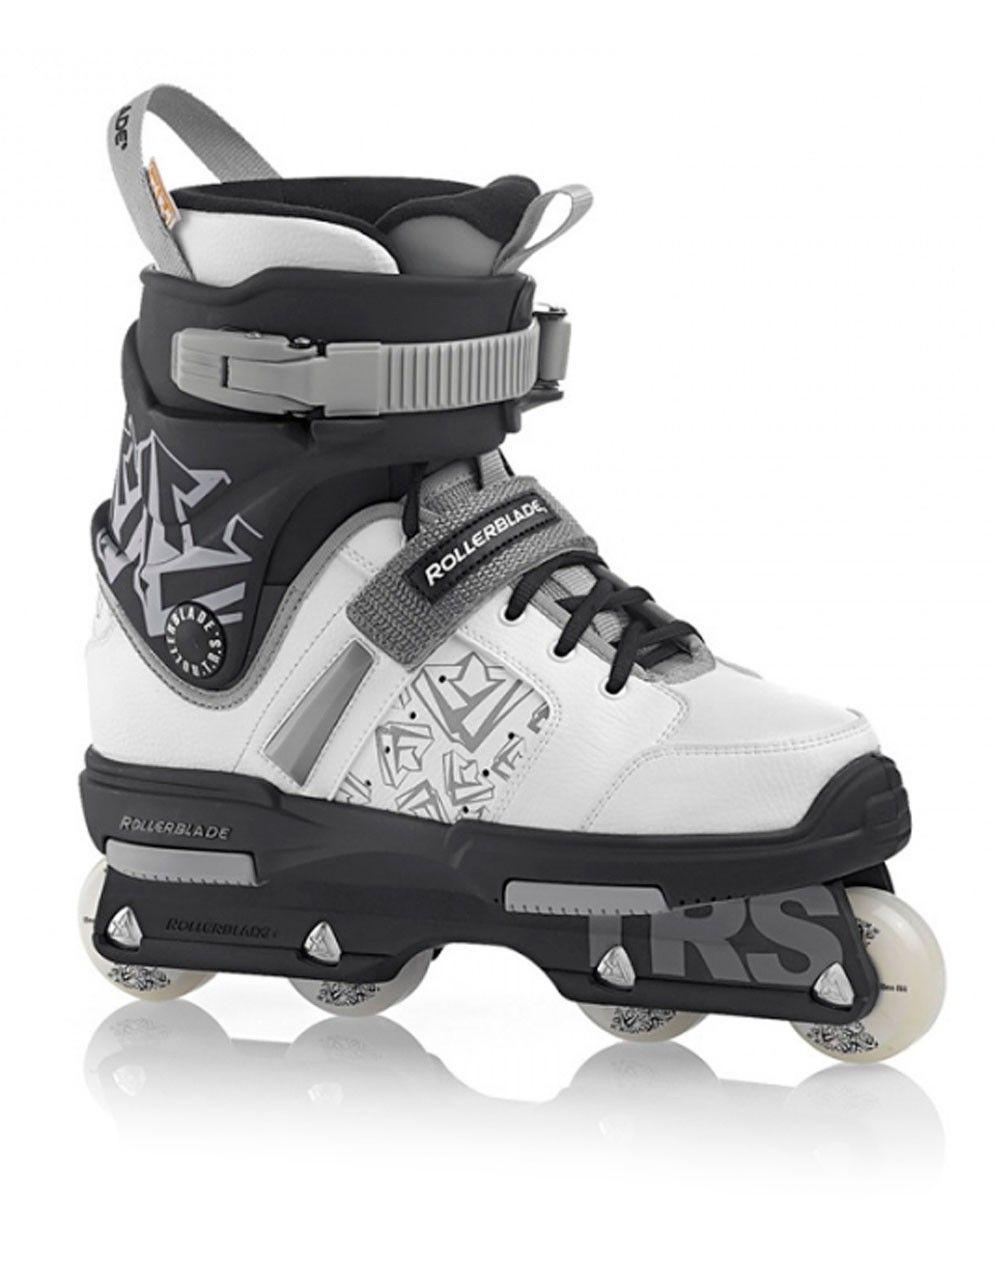 Rollerblade New Jack Aggressive Skate Sk8ter Life Pinterest Powerblade Pro Boot Only Skates Long Inline Skating